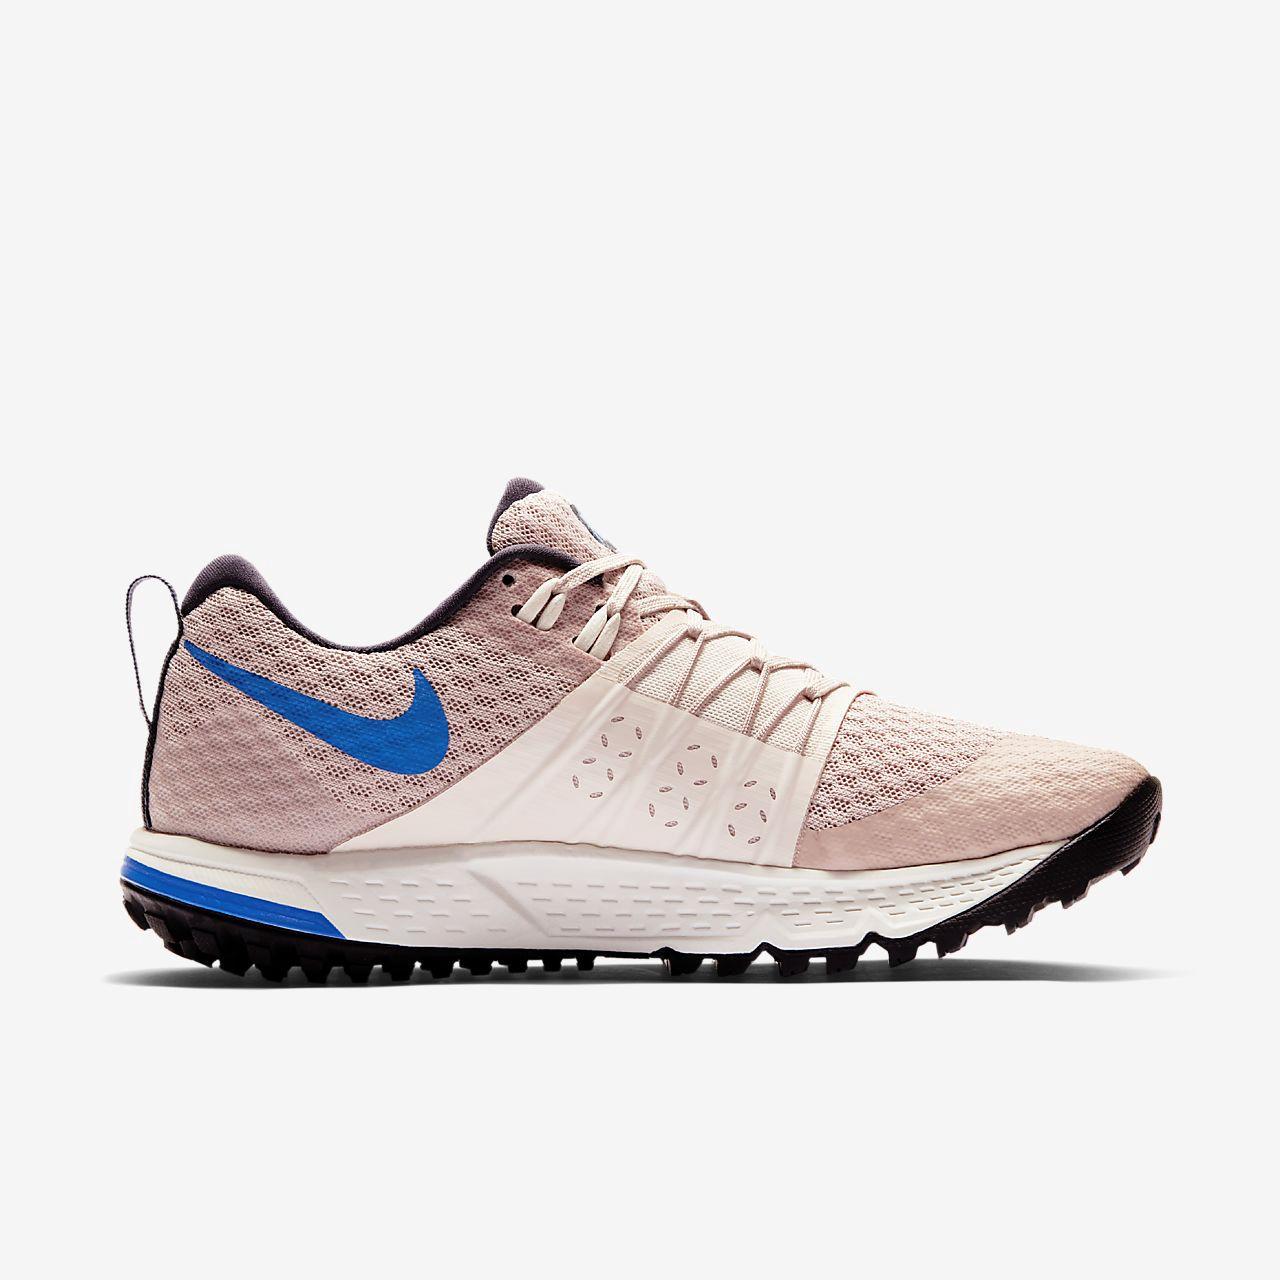 Nike Air Zoom Wildhorse 4 Women's Running Shoe 10.5 Blue